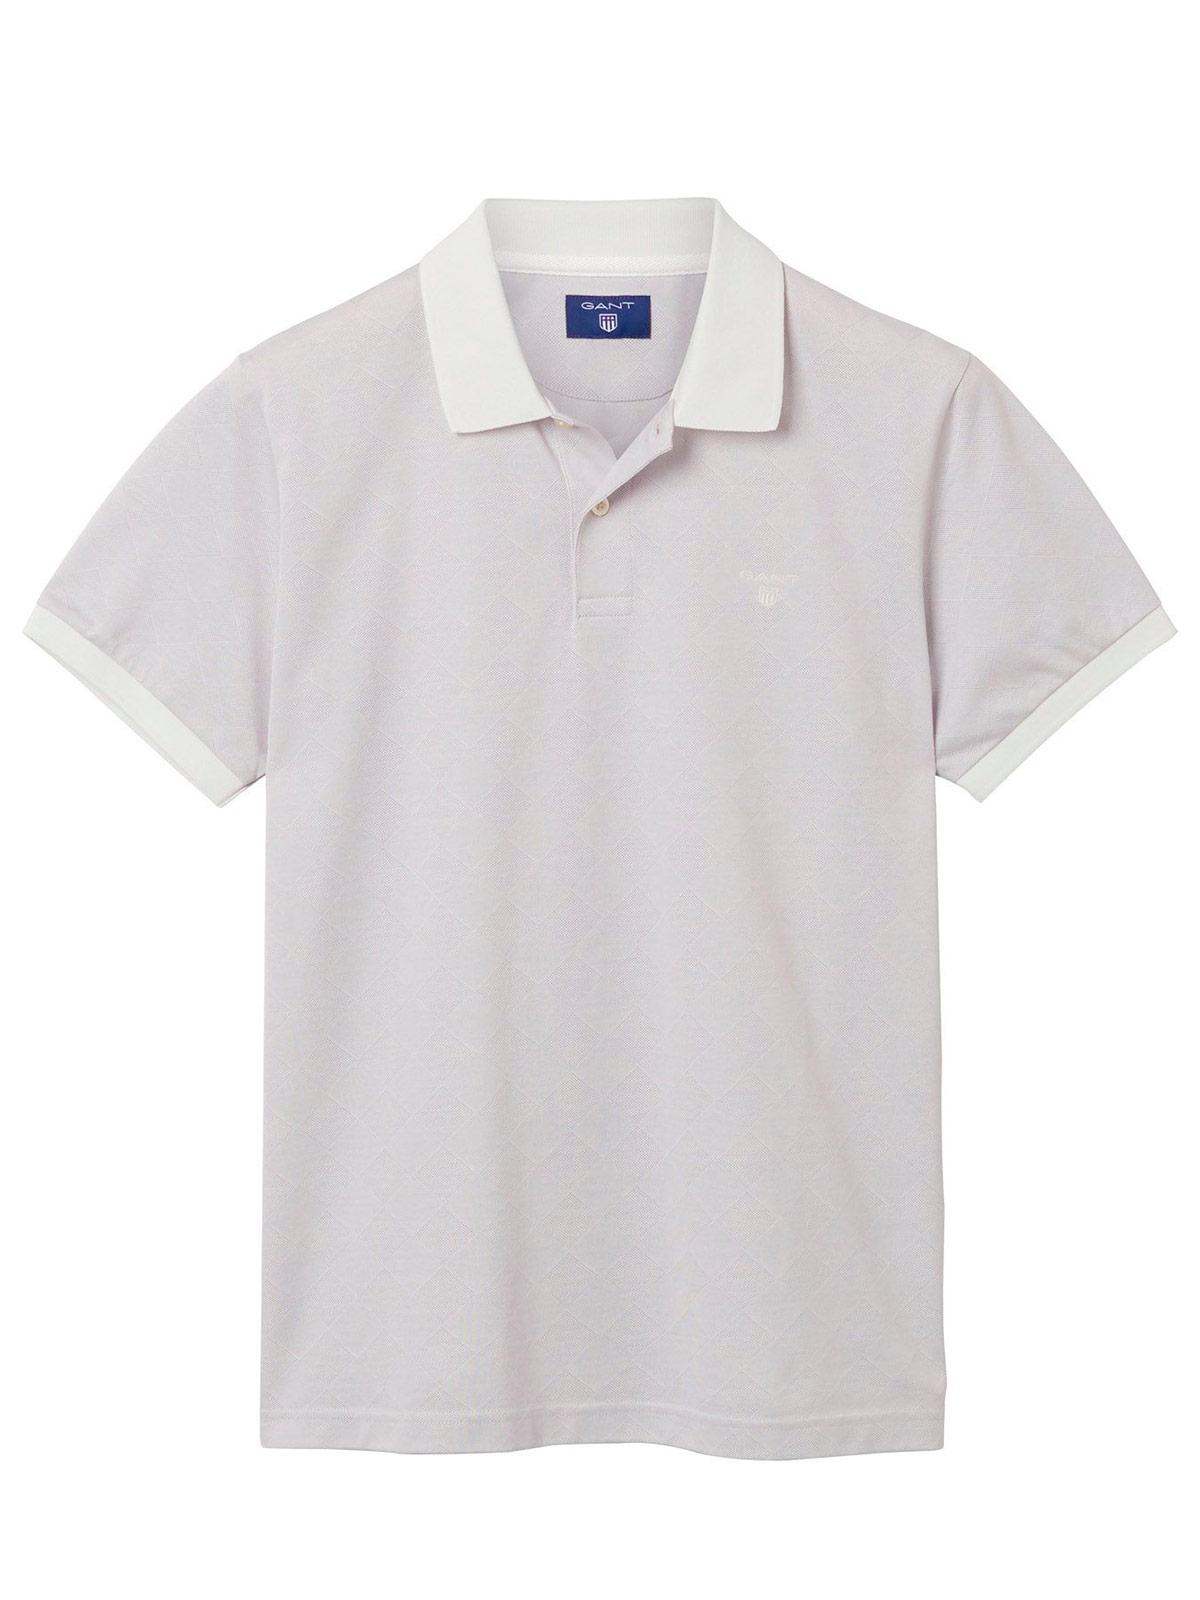 Picture of GANT | Men's Argyle Polo Shirt